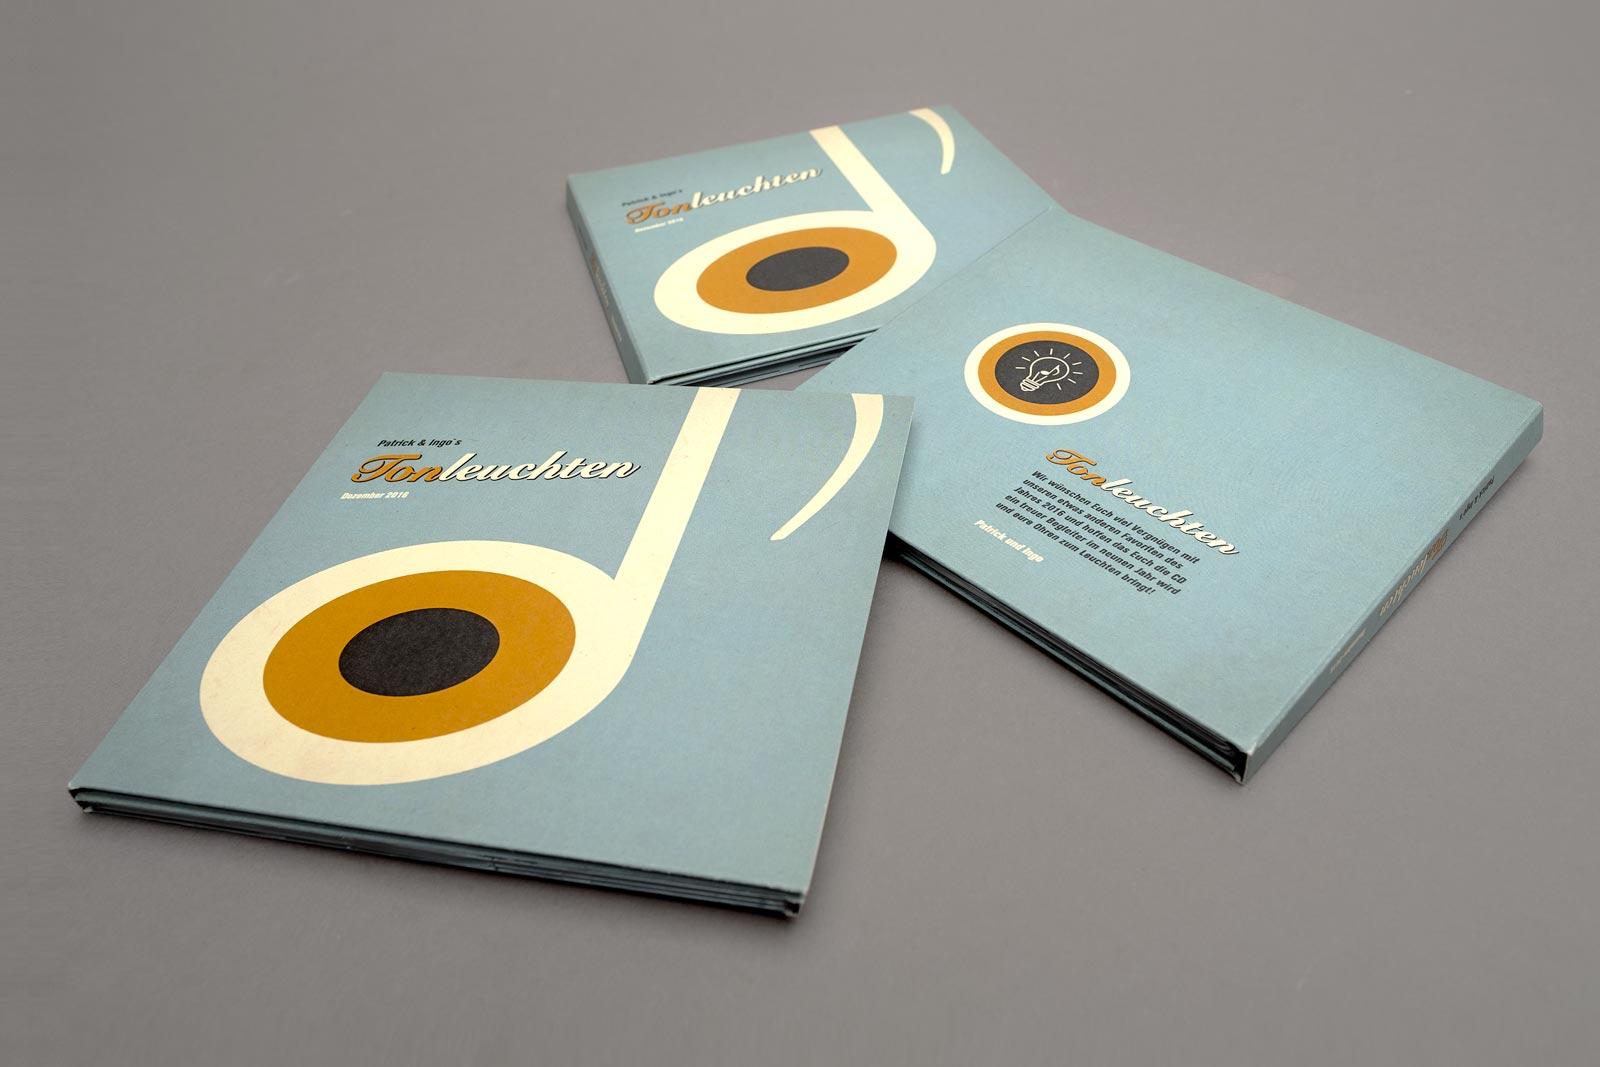 Tonleuchten, Compilation, CD Cover, Rückseite, Cover Artwork, Arrangement